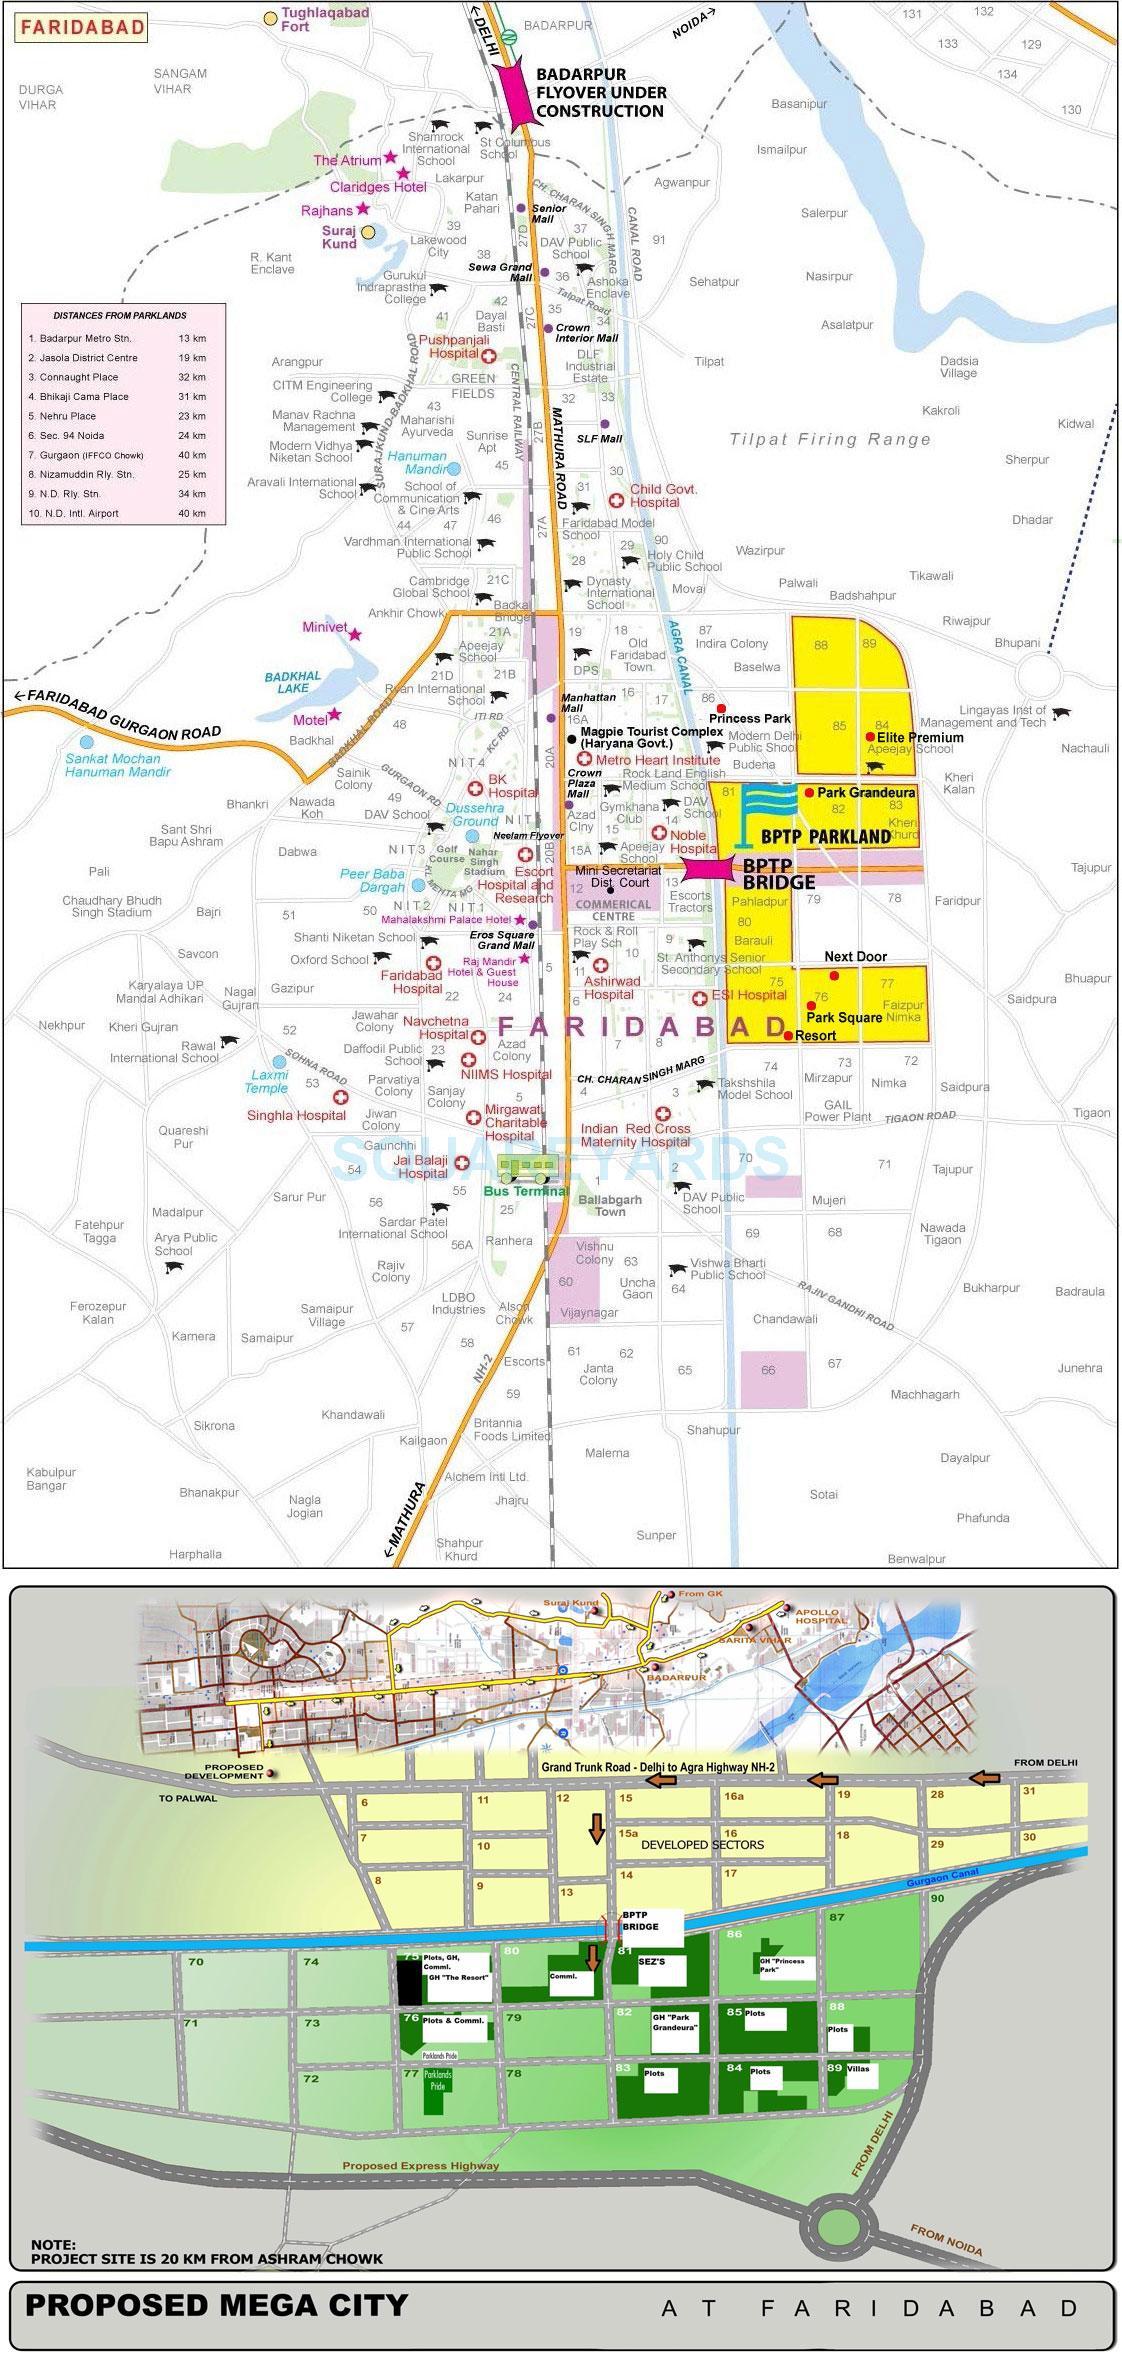 location-image-Picture-bptp-park-floors-ii-2480995